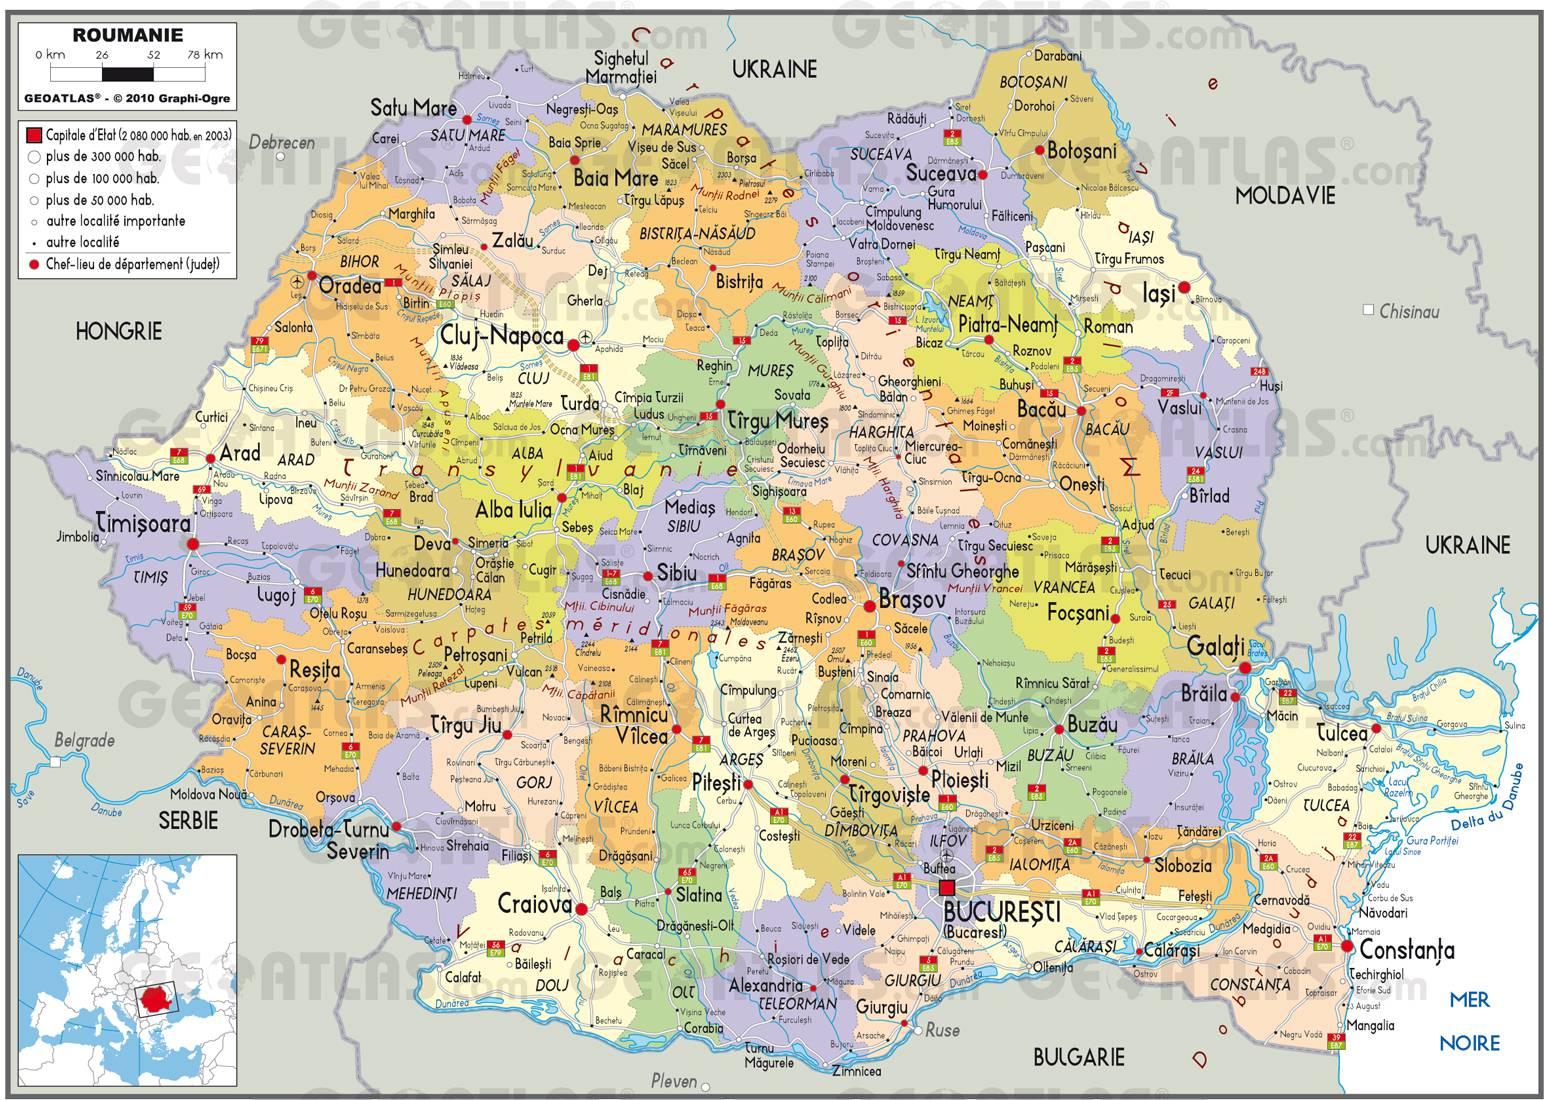 Carte administrative de la Roumanie